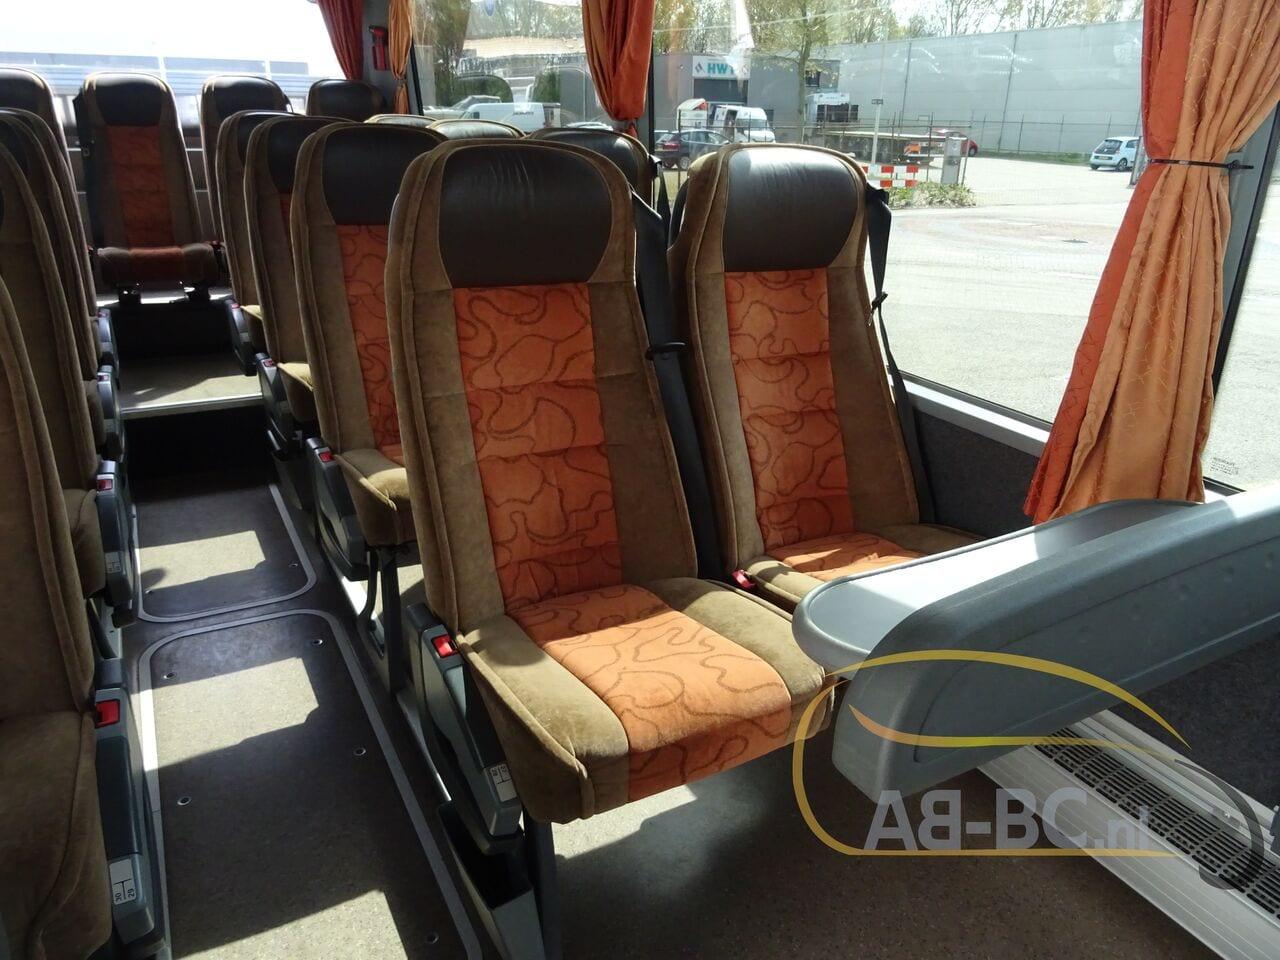 coach-busSETRA-S416H-48-SEATS-LIFTBUS---1620309911788381610_big_39bd7f950ffe8e03fb774a11e2a746bb--21050616581387095000